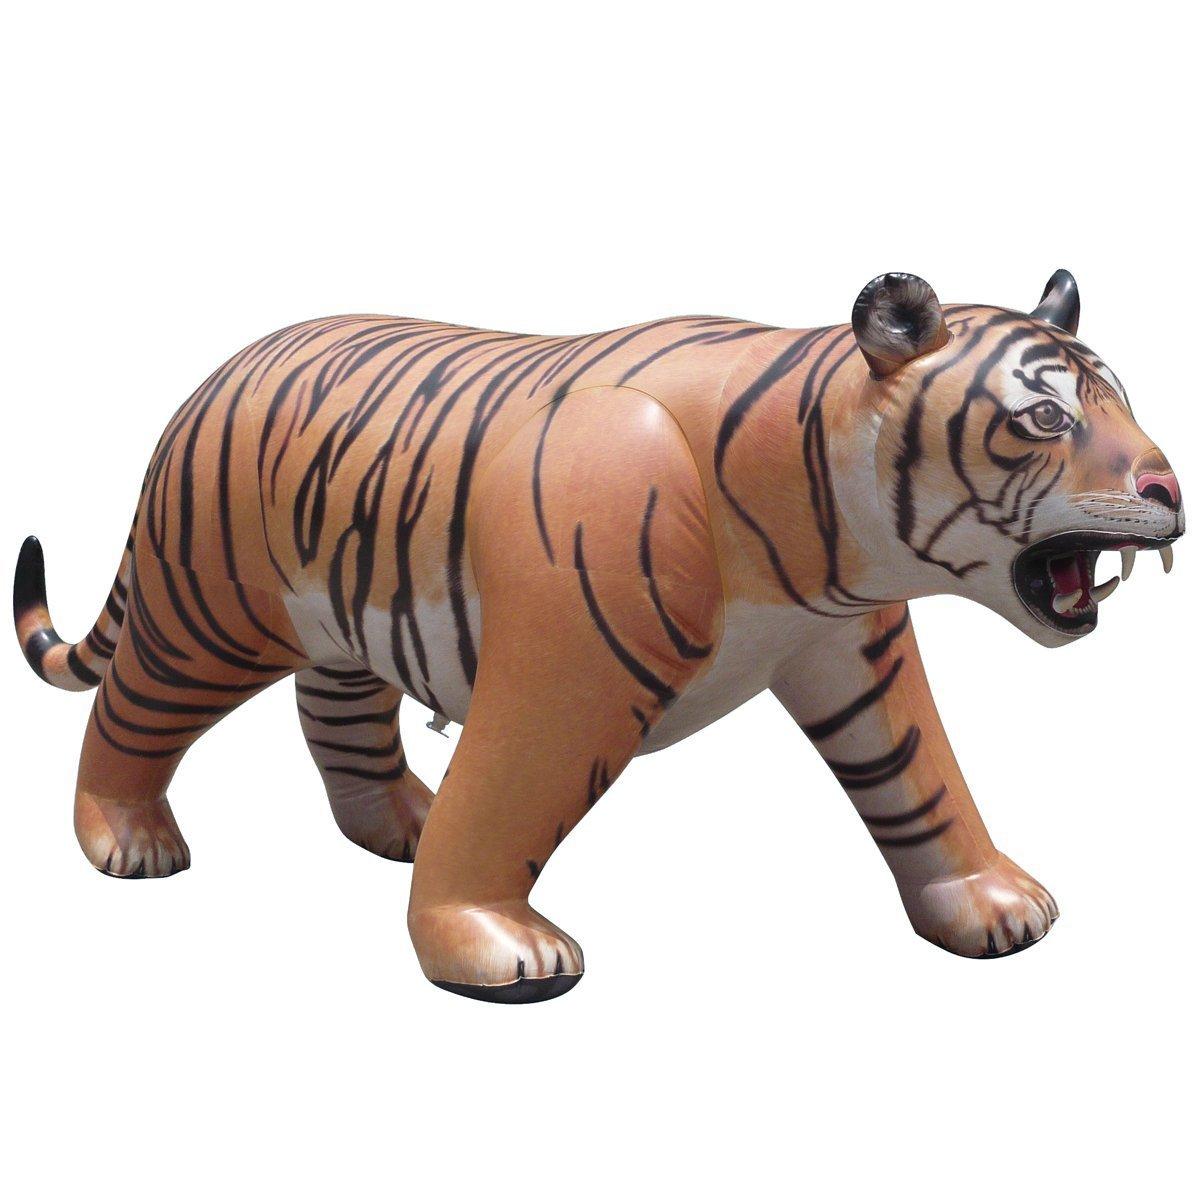 Inflatable Lifelike Life Size Replica Tiger, 96'' Long